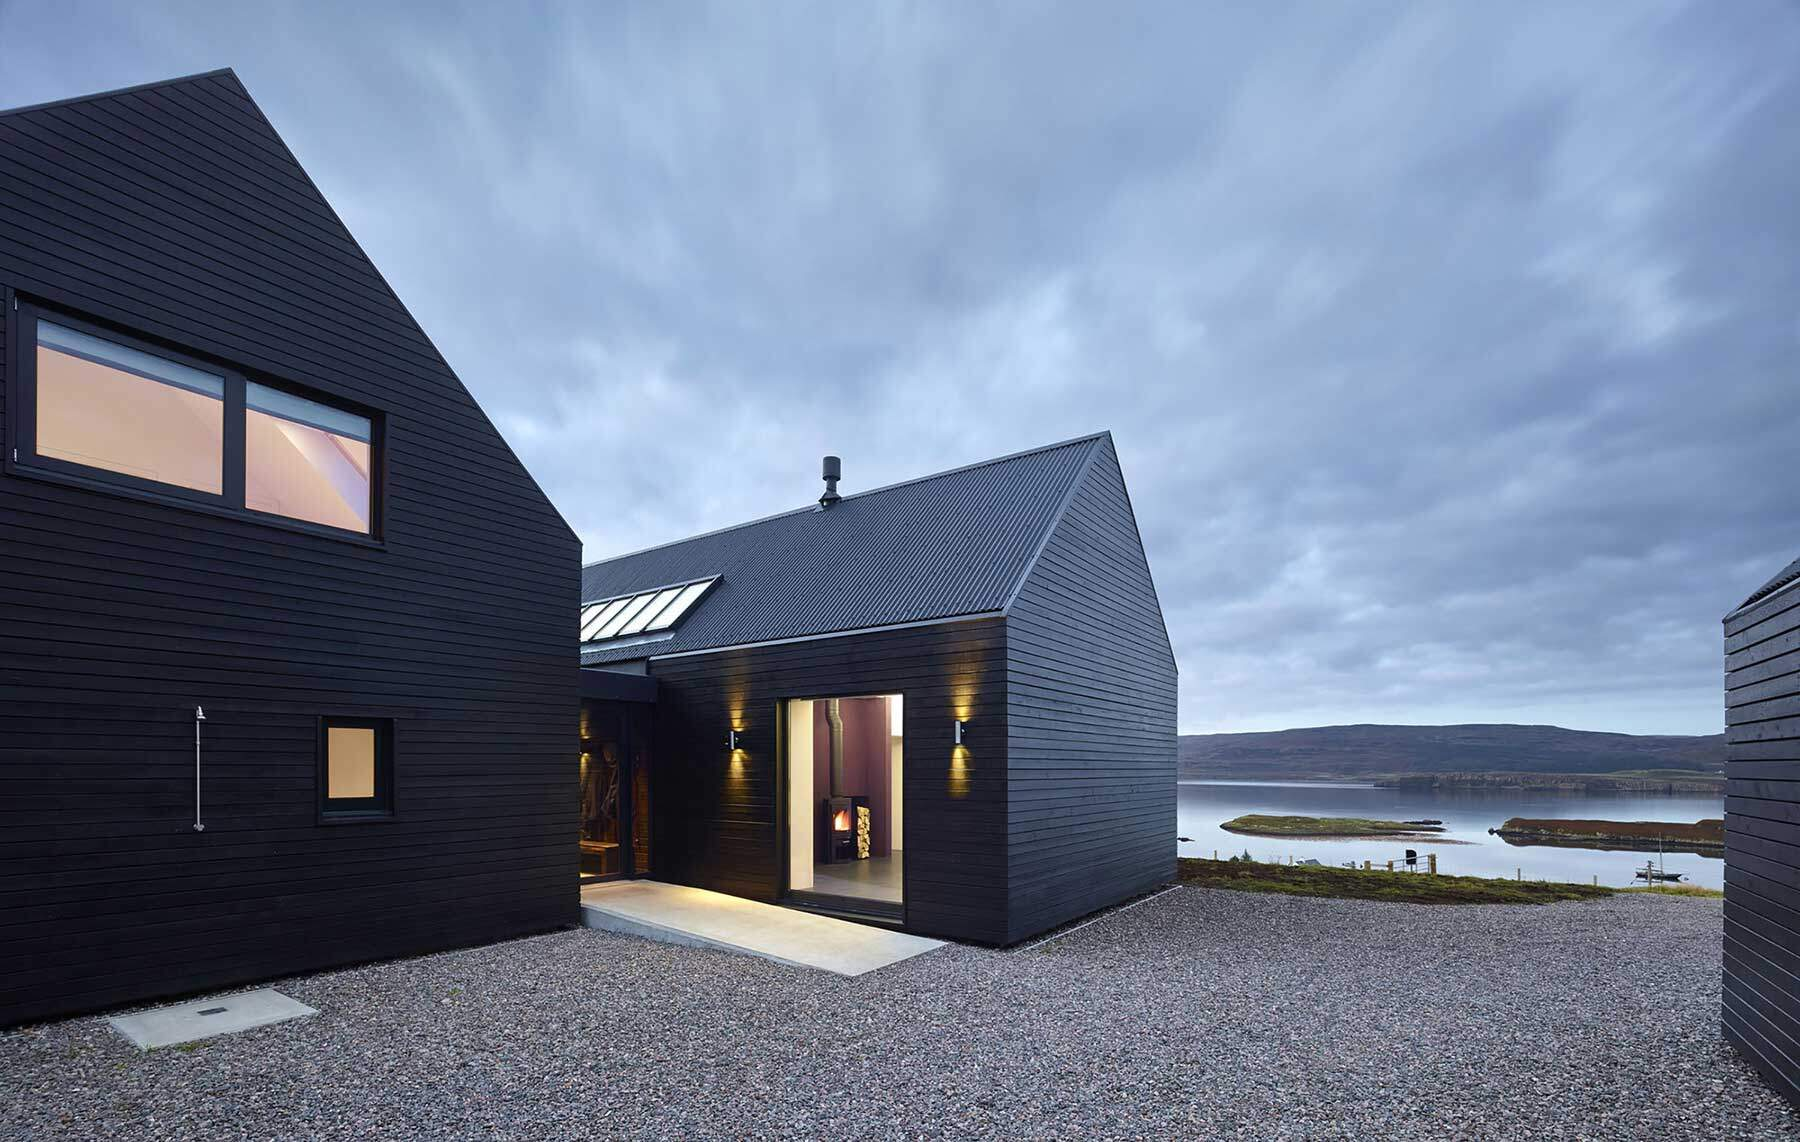 Skye Island House Inspired By Scottish Farm Barns